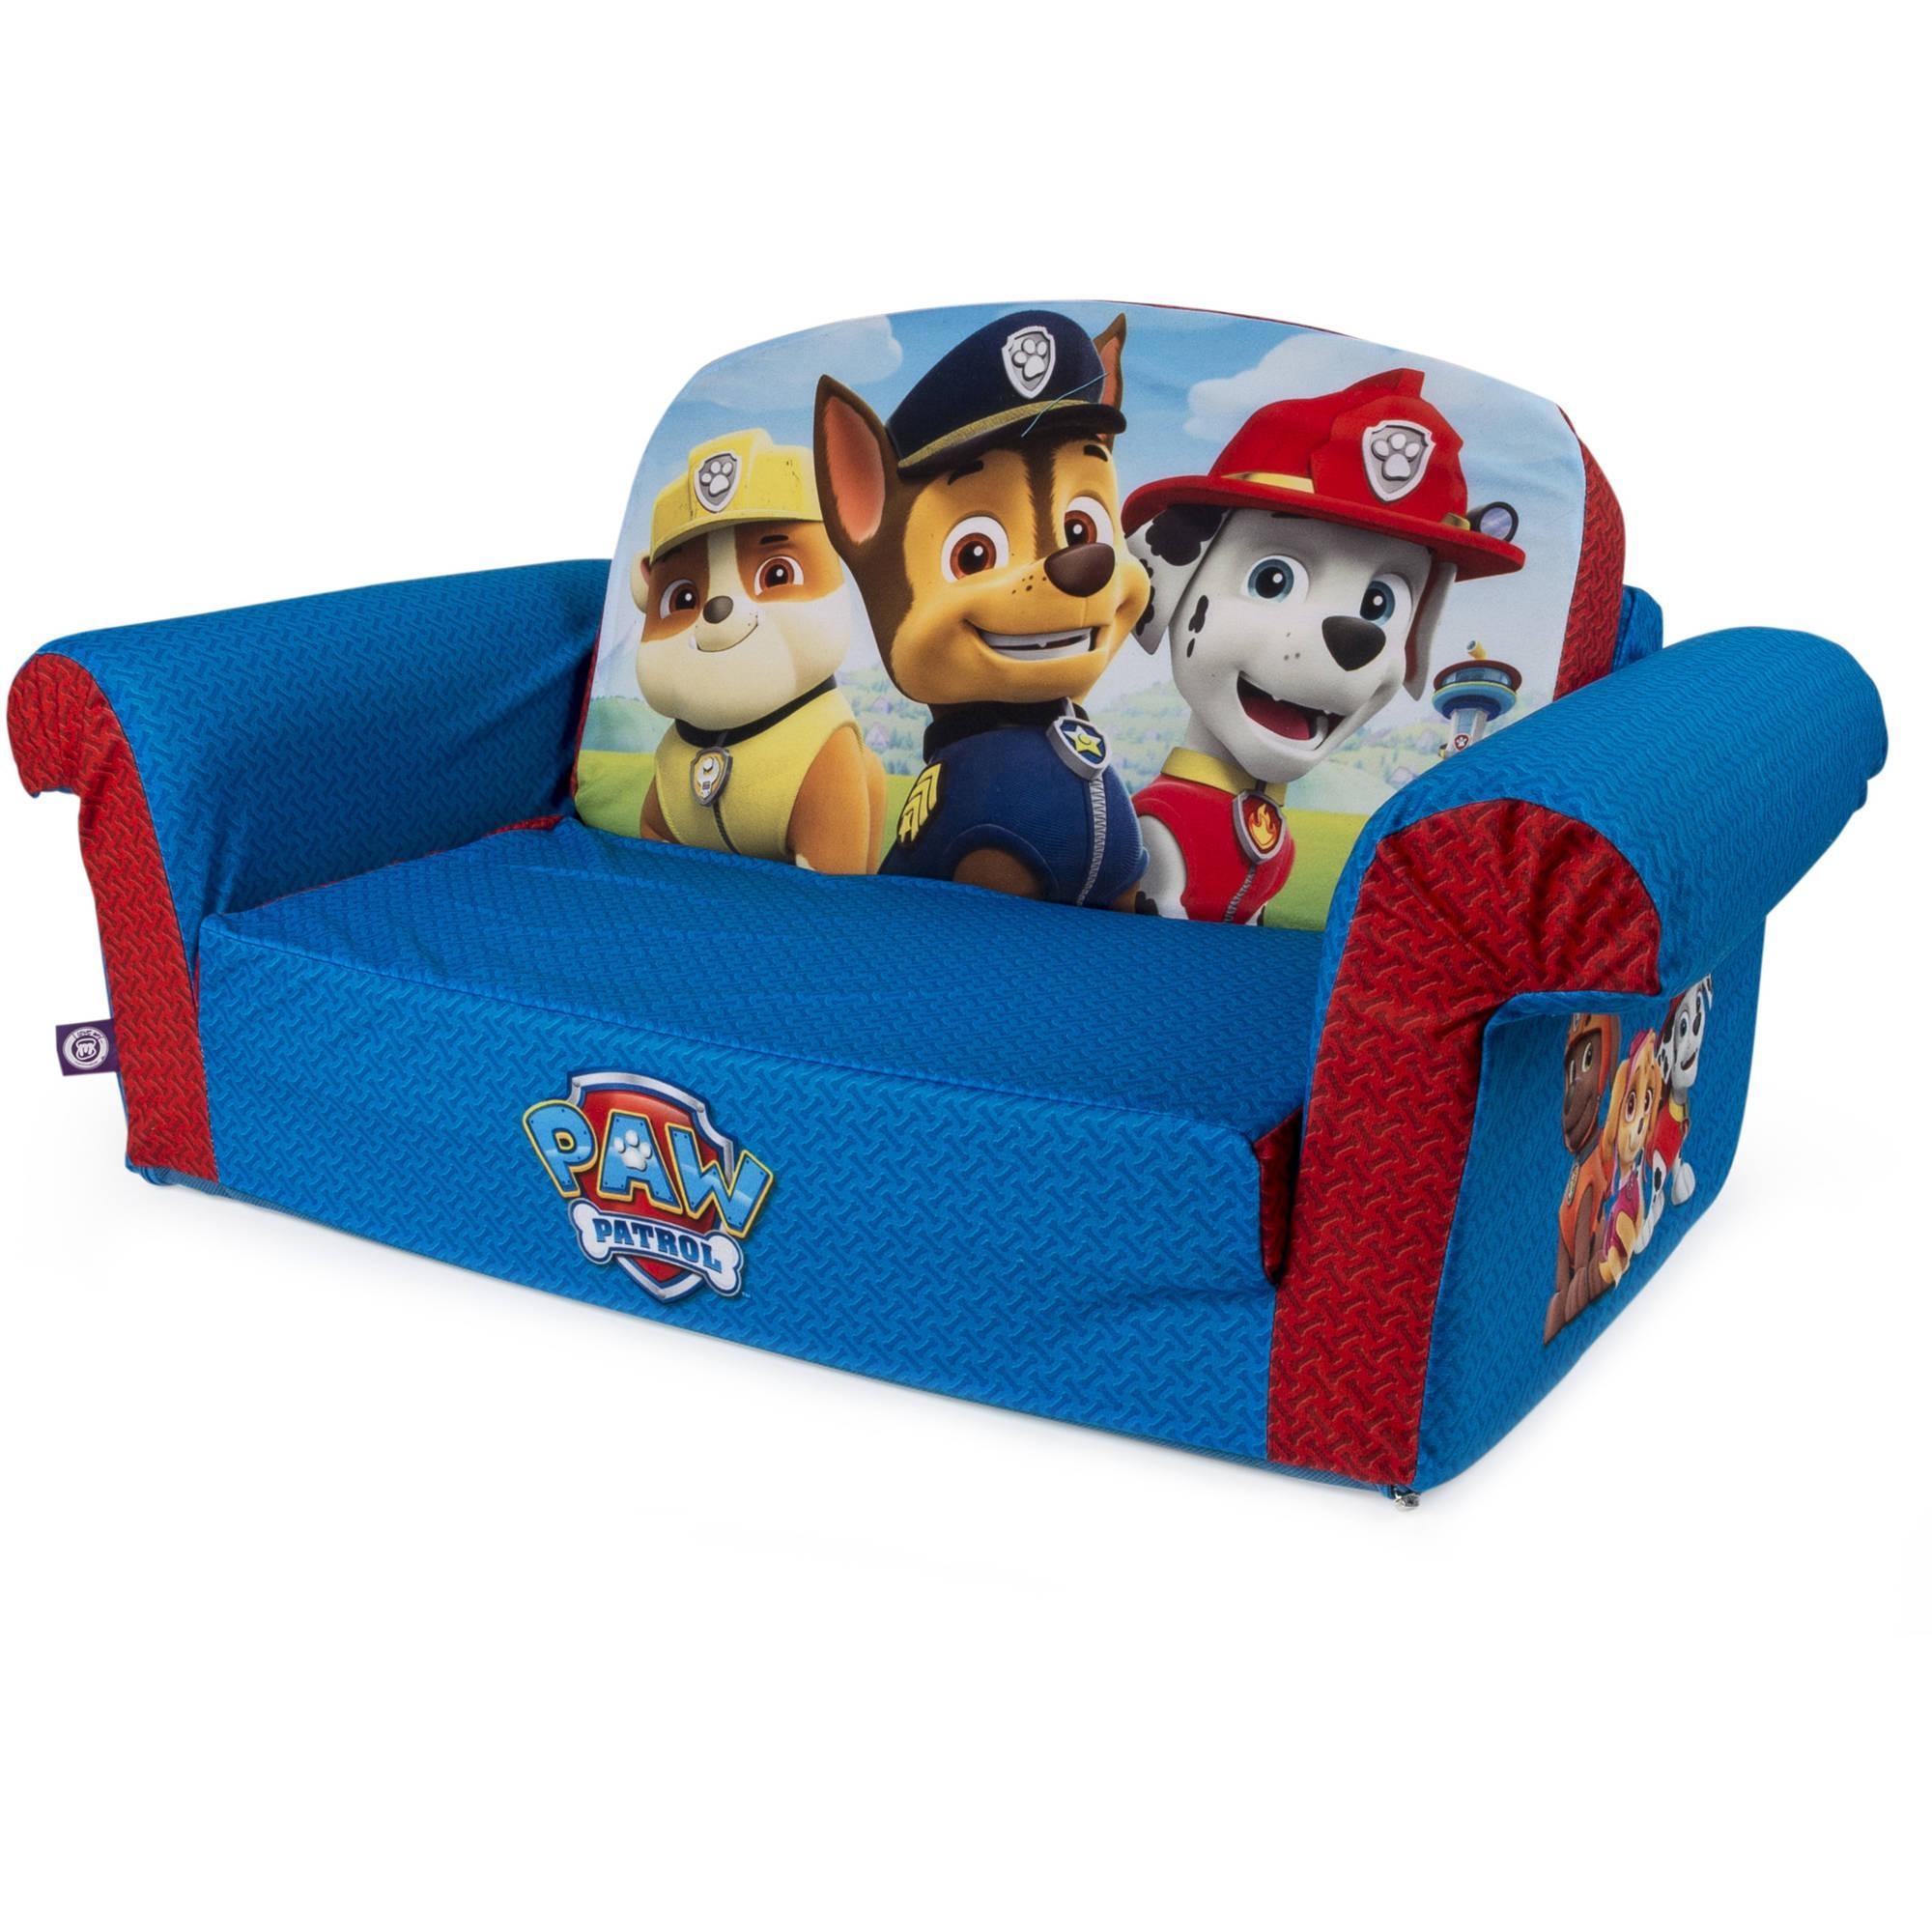 Marshmallow Furniture, Children's 2 In 1 Flip Open Foam Sofa Within Kid Flip Open Sofa Beds (Image 17 of 20)